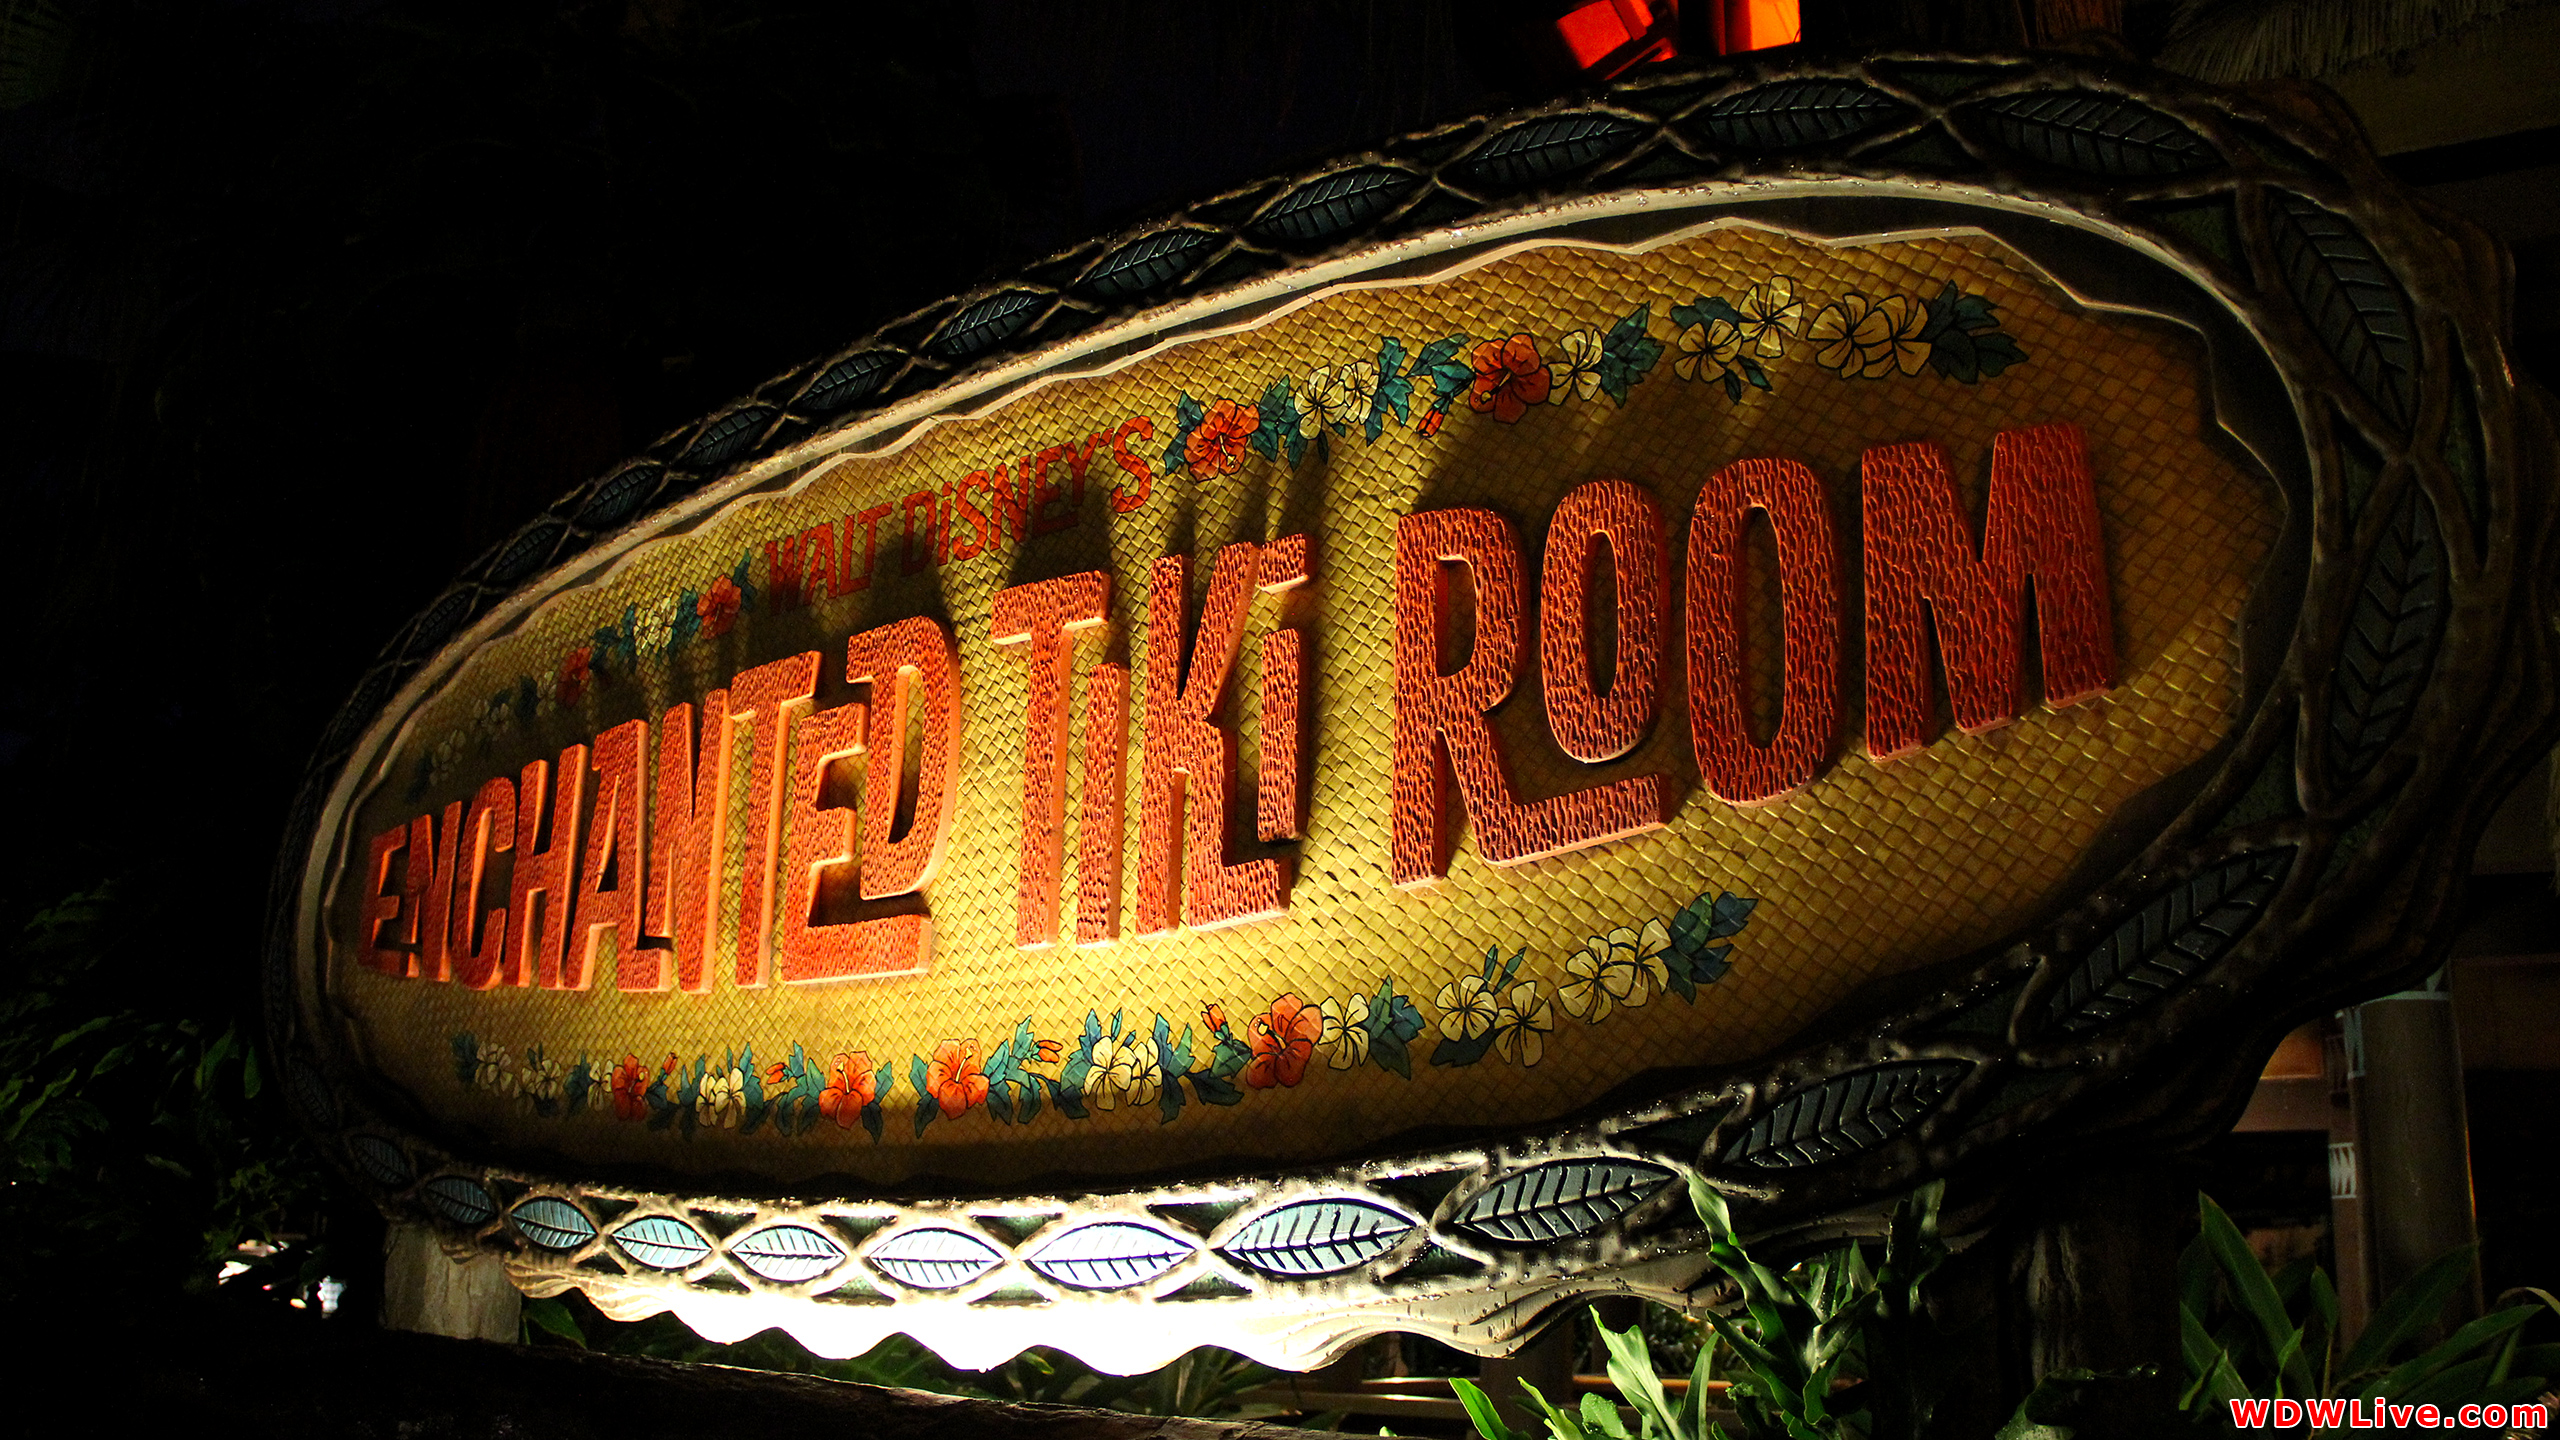 The Enchanted Tiki Room Main Attraction Sign At Night 2560x1440